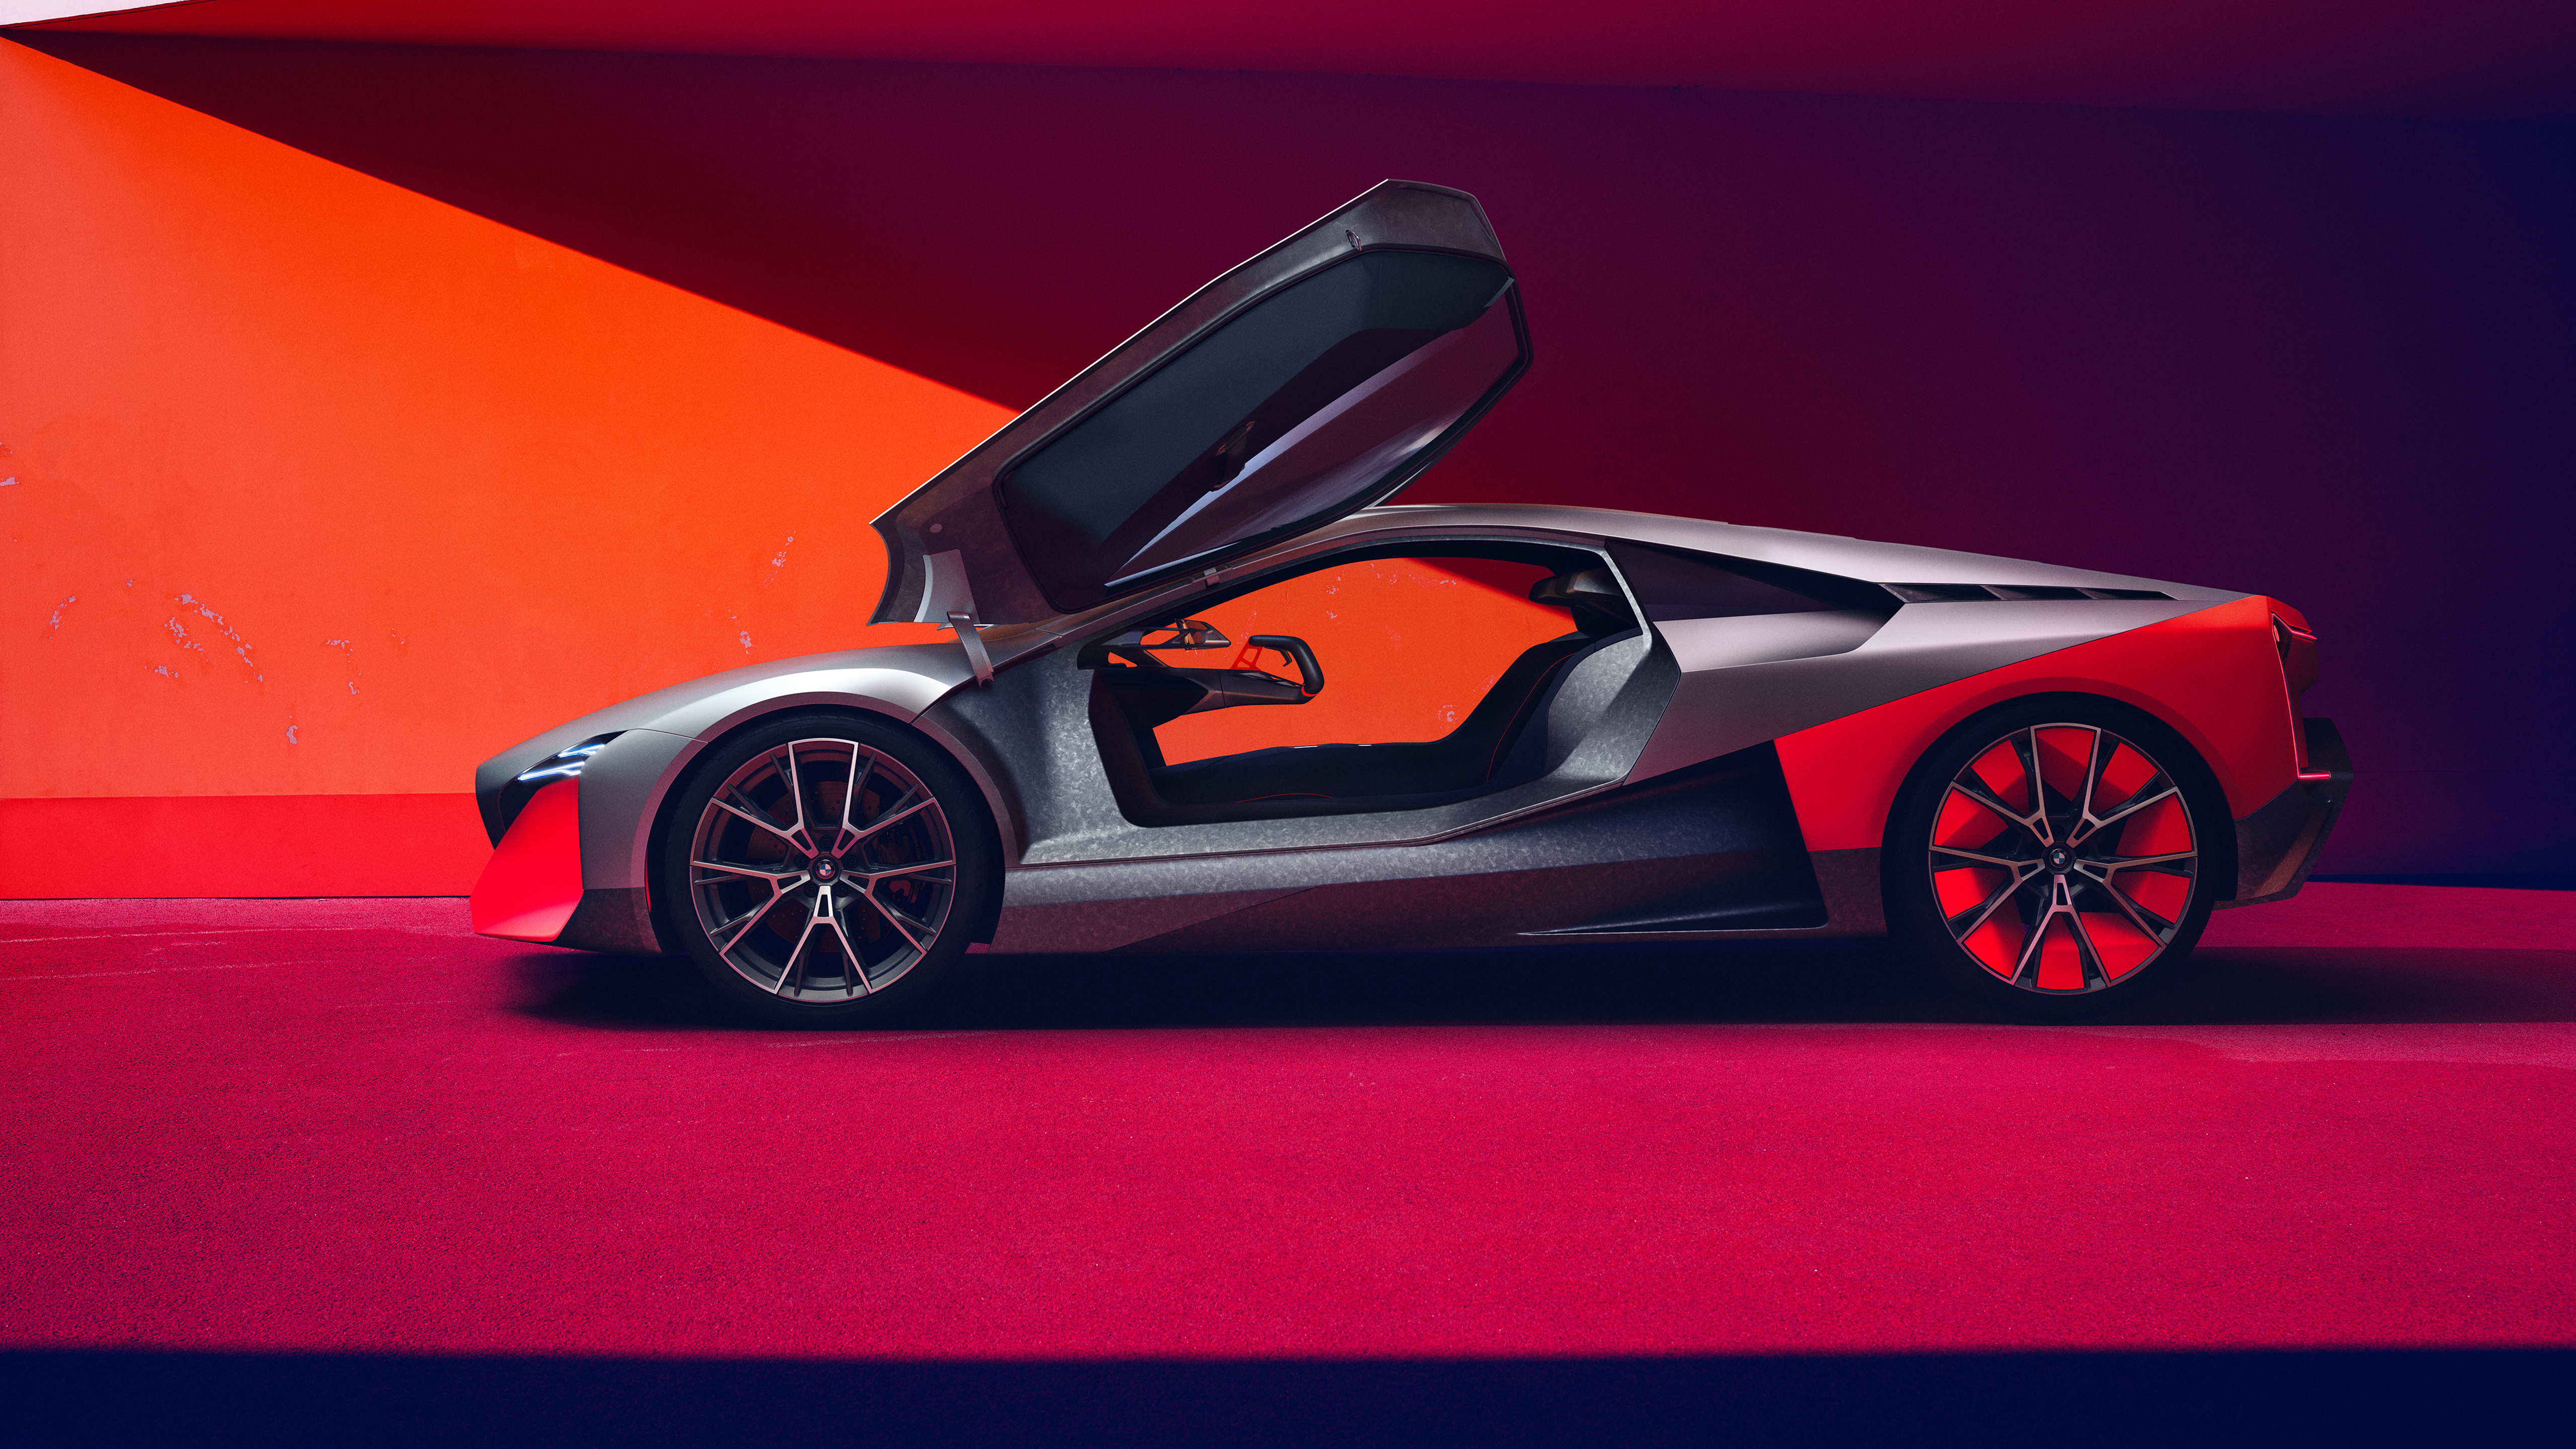 Bmw Vision M Next 2019 4k 11 Wallpaper Hd Car Wallpapers Id 12800